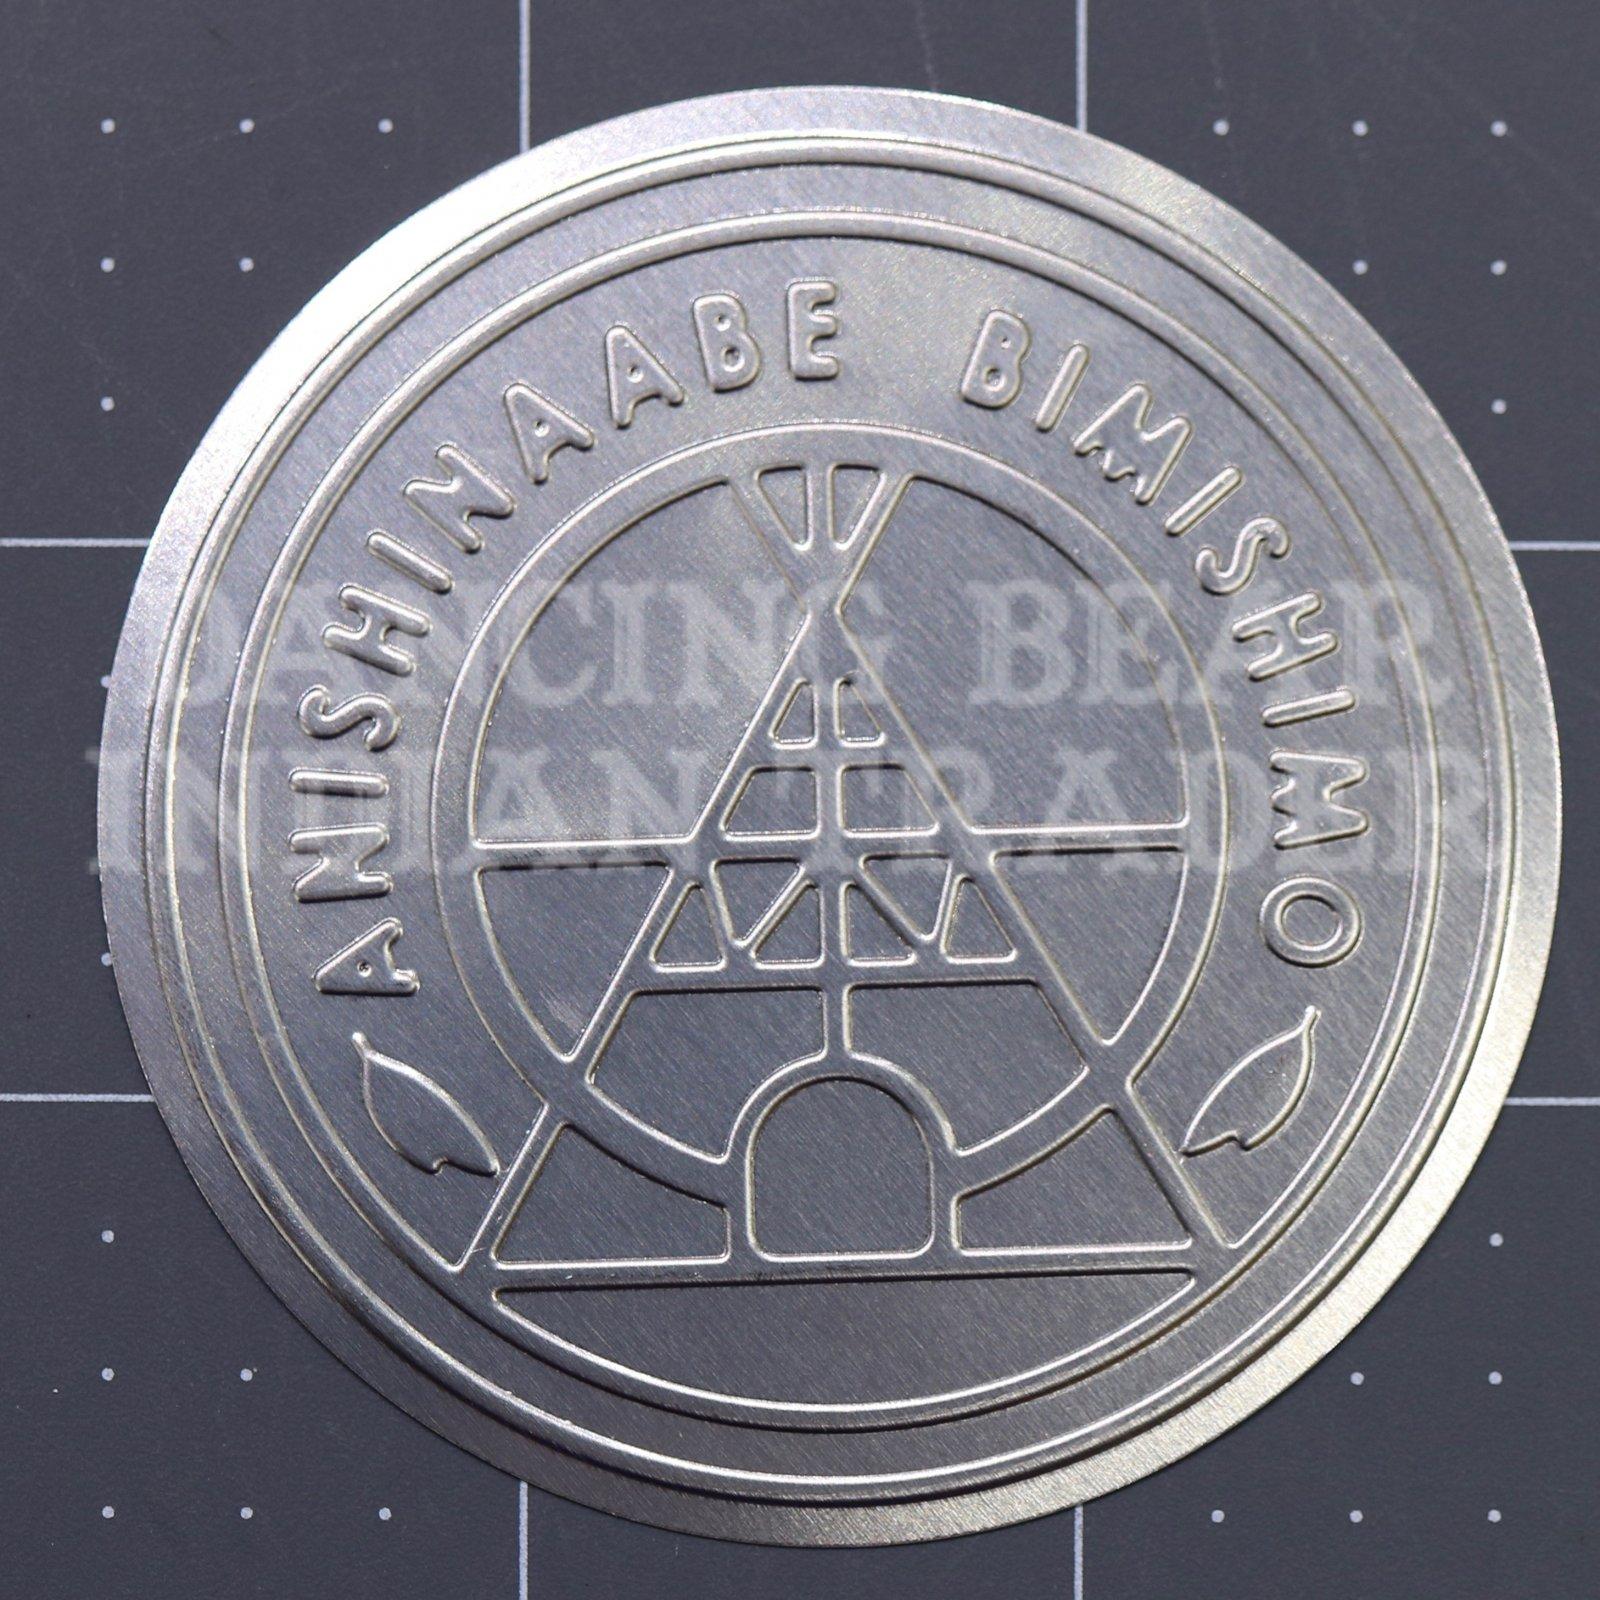 Anishinaabe Bimishimo Pattern Adult Jingles 100 pc Flat Nickel Silver